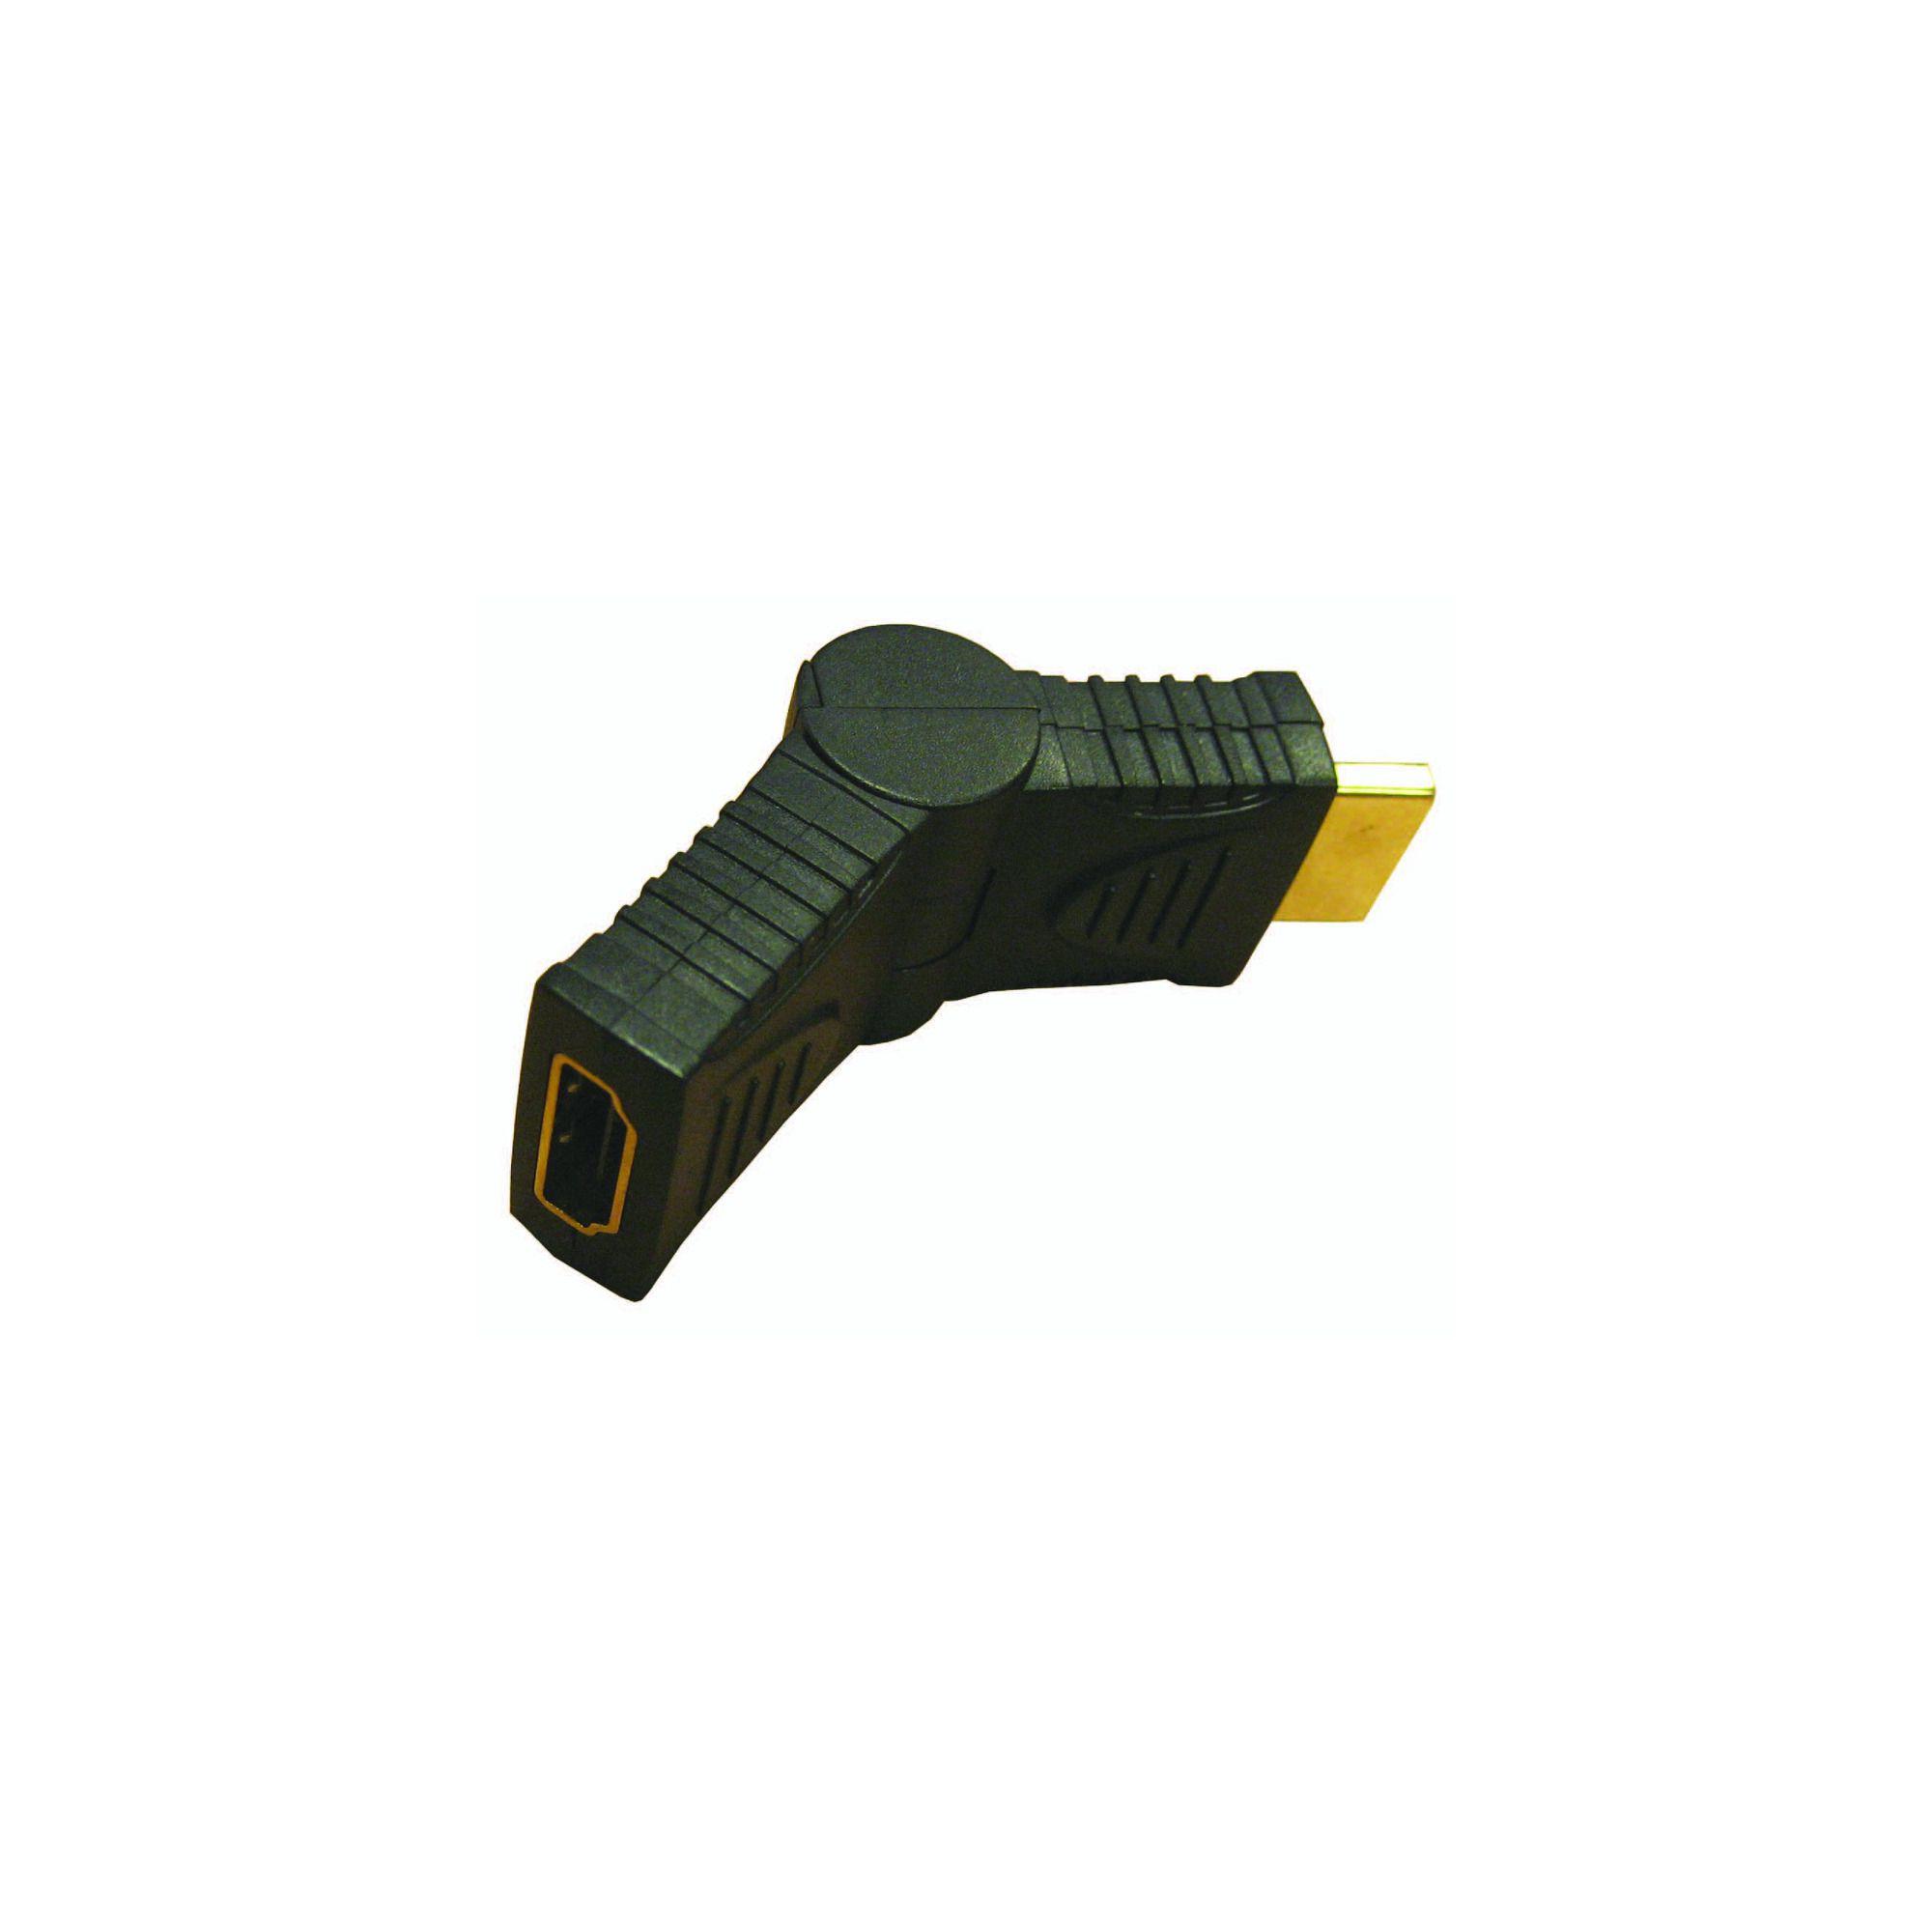 Dvi To Hdmi Adapter Tesco Vw Bluetooth Pairing Adapter Thunderbolt 3 To Thunderbolt 2 And Usb Adapter V Brake Adapter For 700c Wheel: Myshop